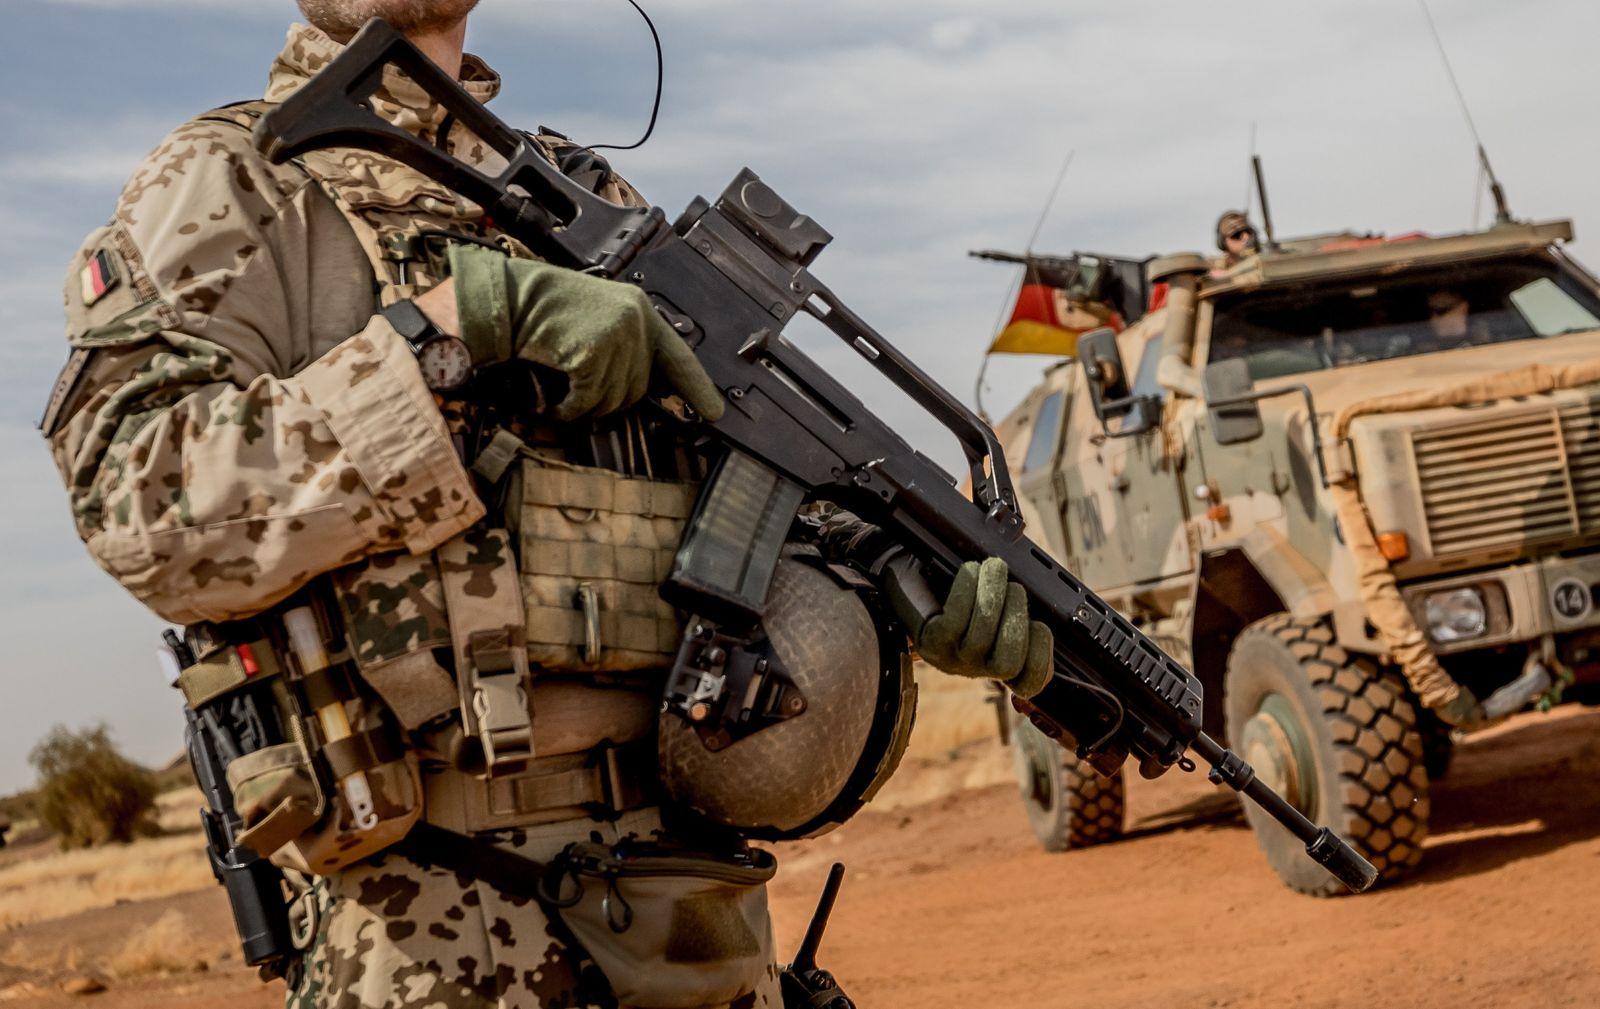 Bundestag - Bundeswehr in Mali